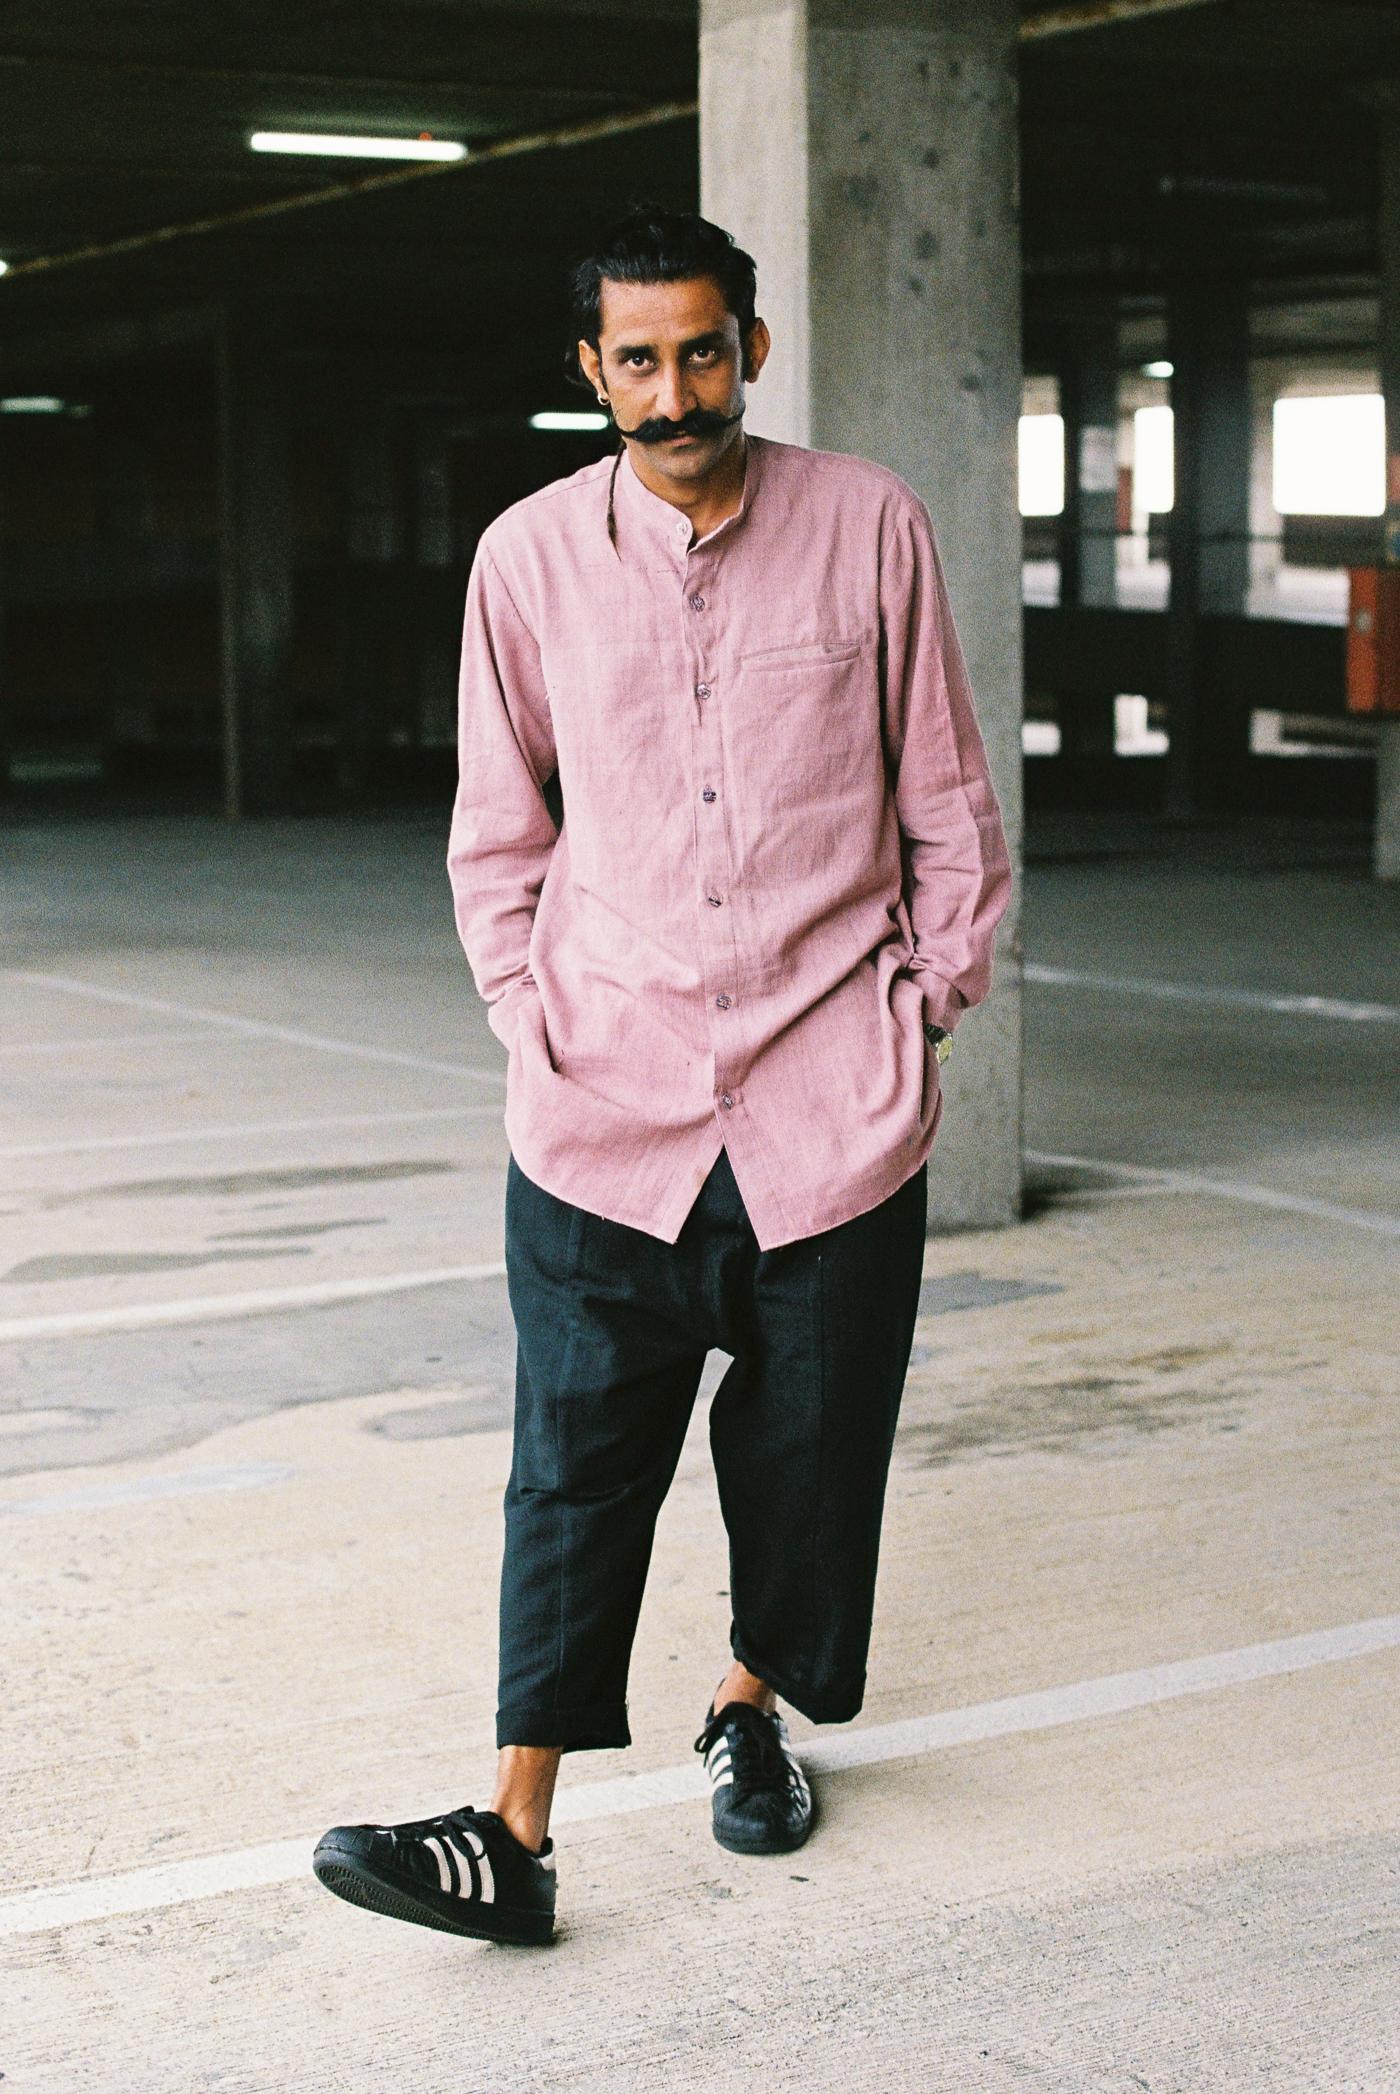 pinkshirtblackpants-5.jpg